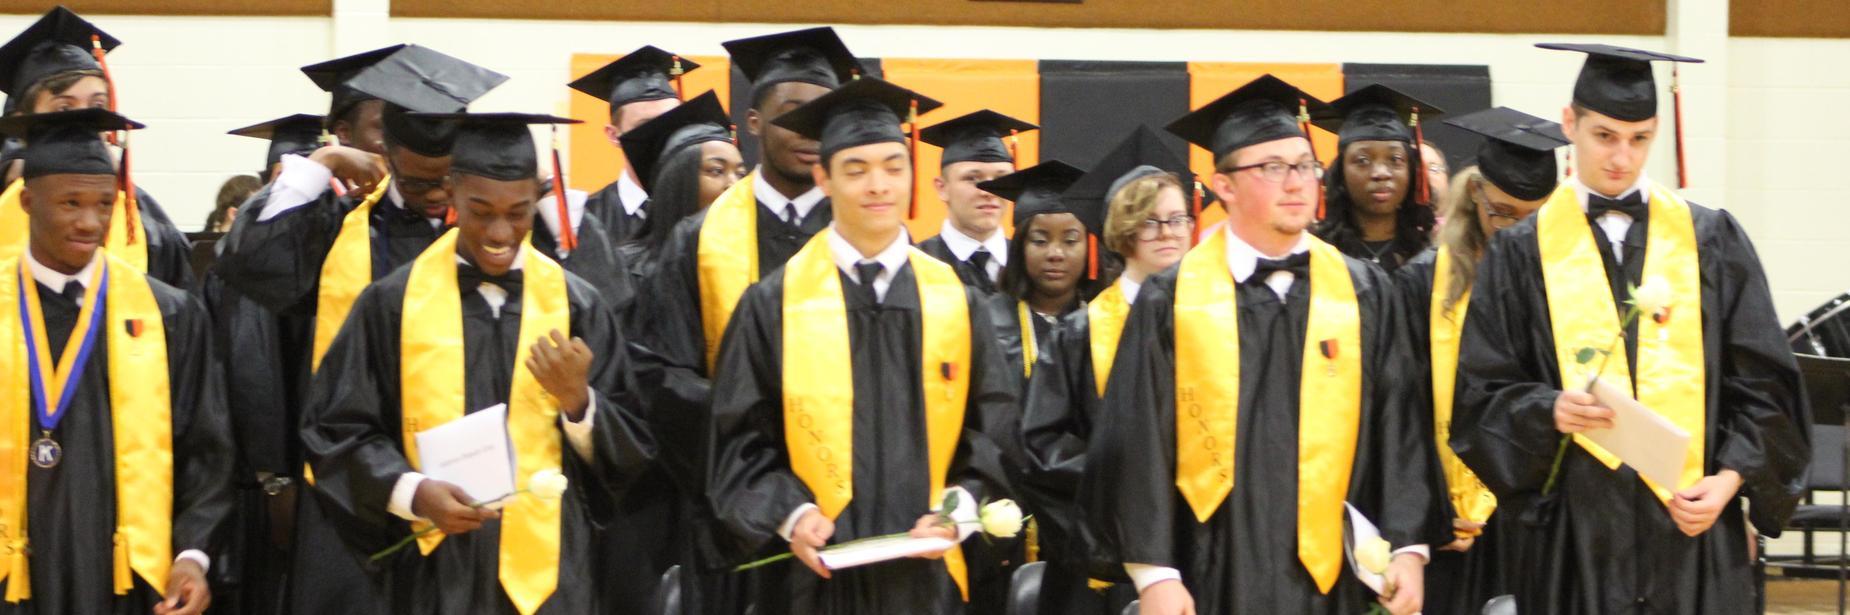 ghs graduation